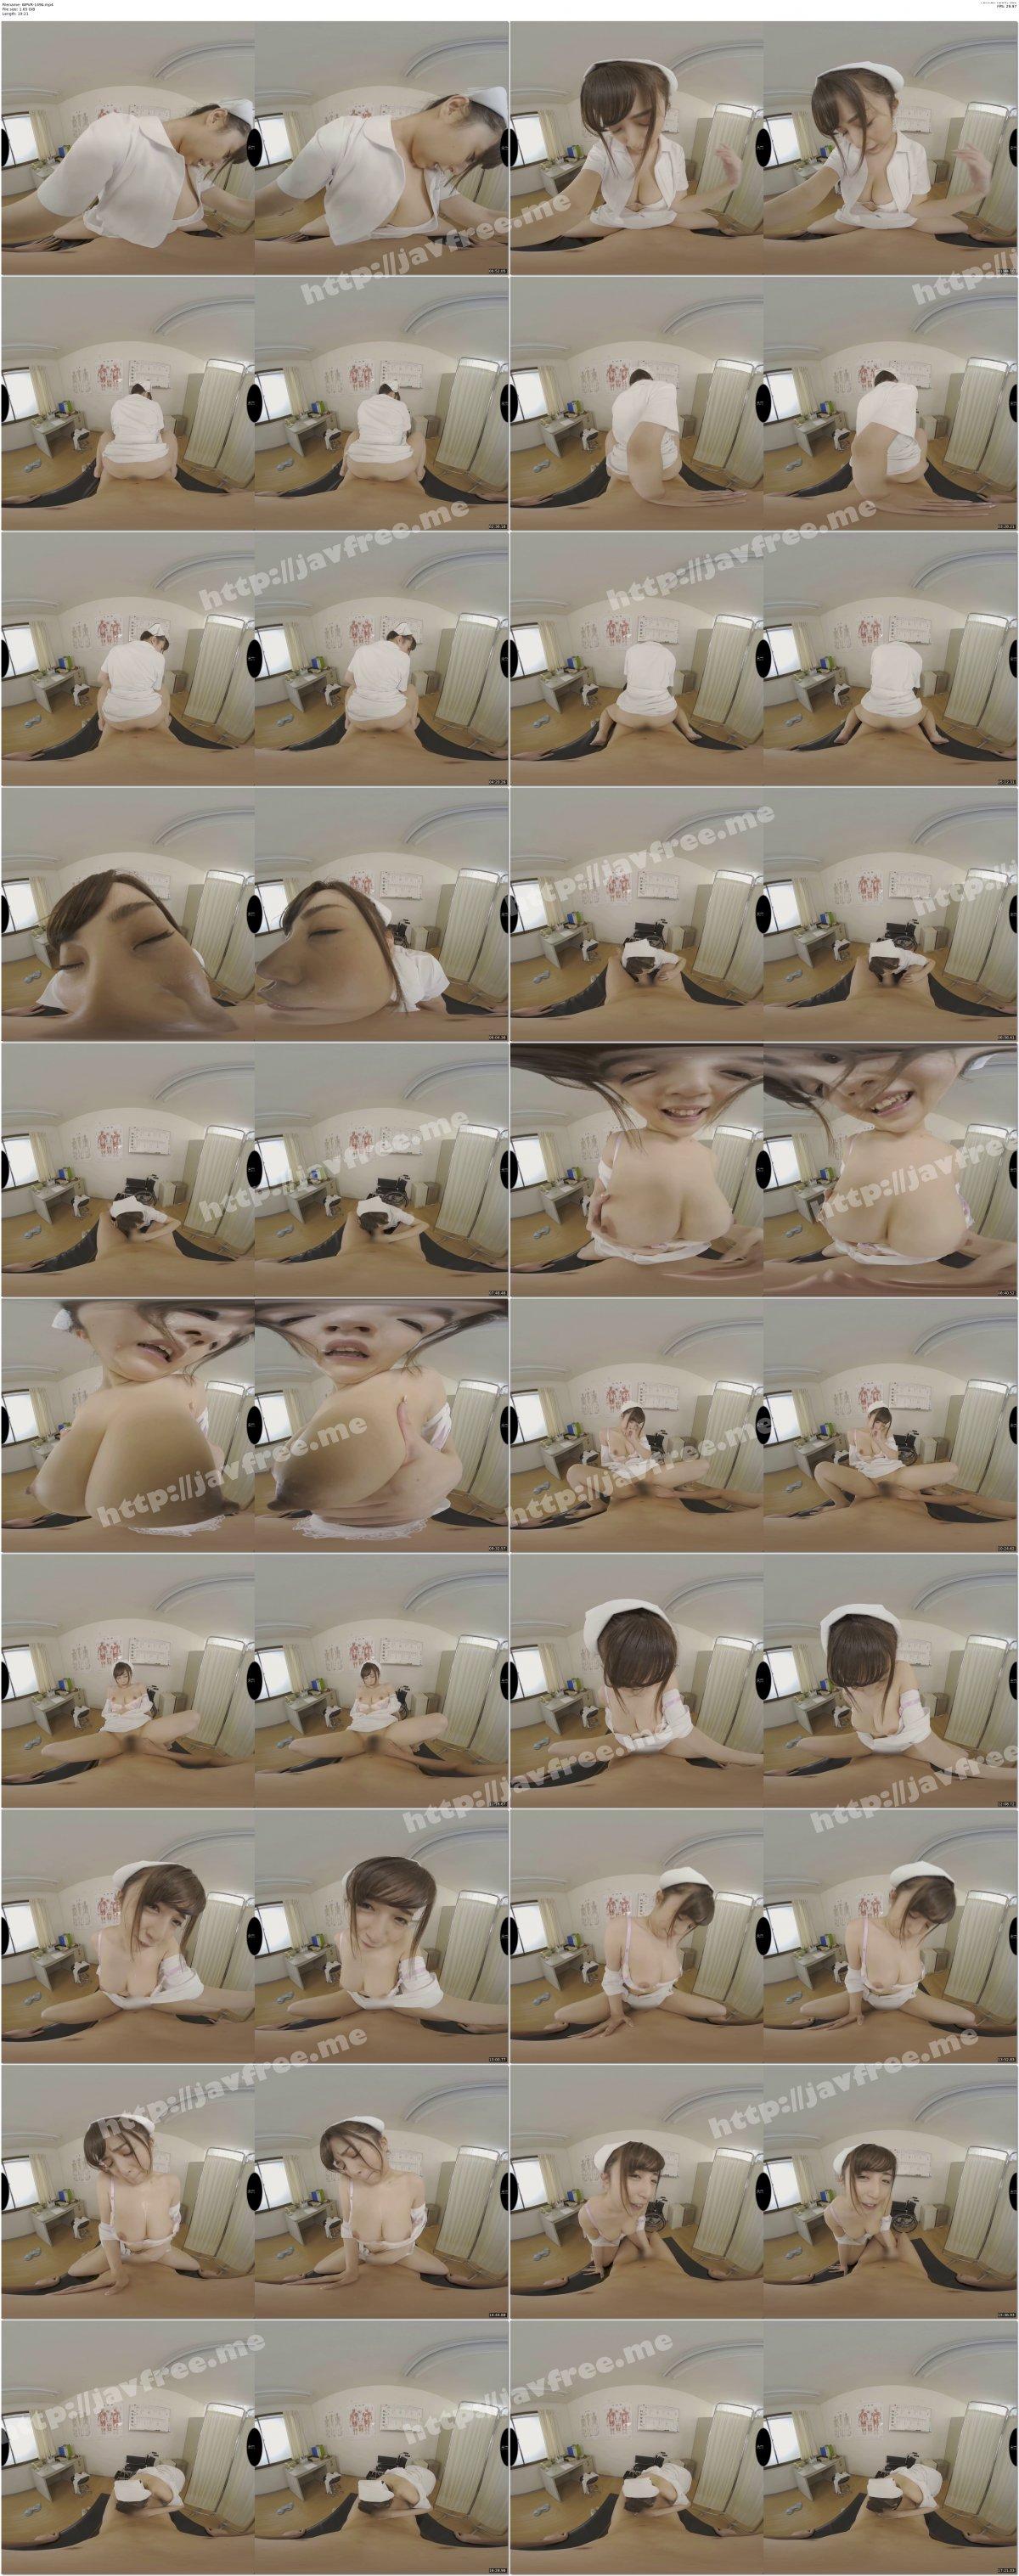 [WPVR-149] 【VR】包茎手術患者と病院で声ガマン性交…でも診察室で生はマズくない? 逢沢まりあ - image WPVR-149b on https://javfree.me